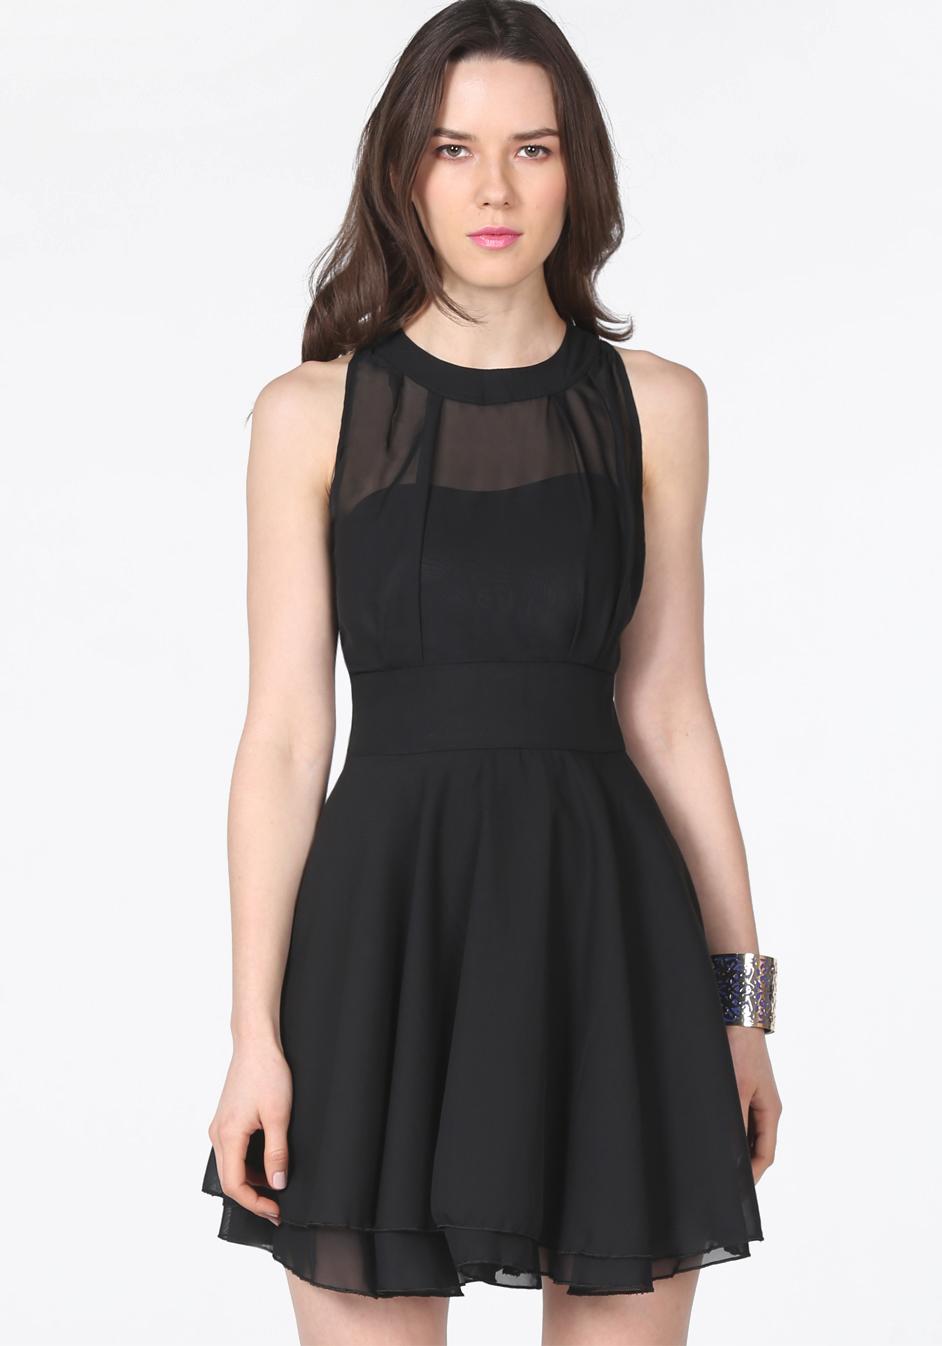 Black contrast mesh yoke backless pleated dress